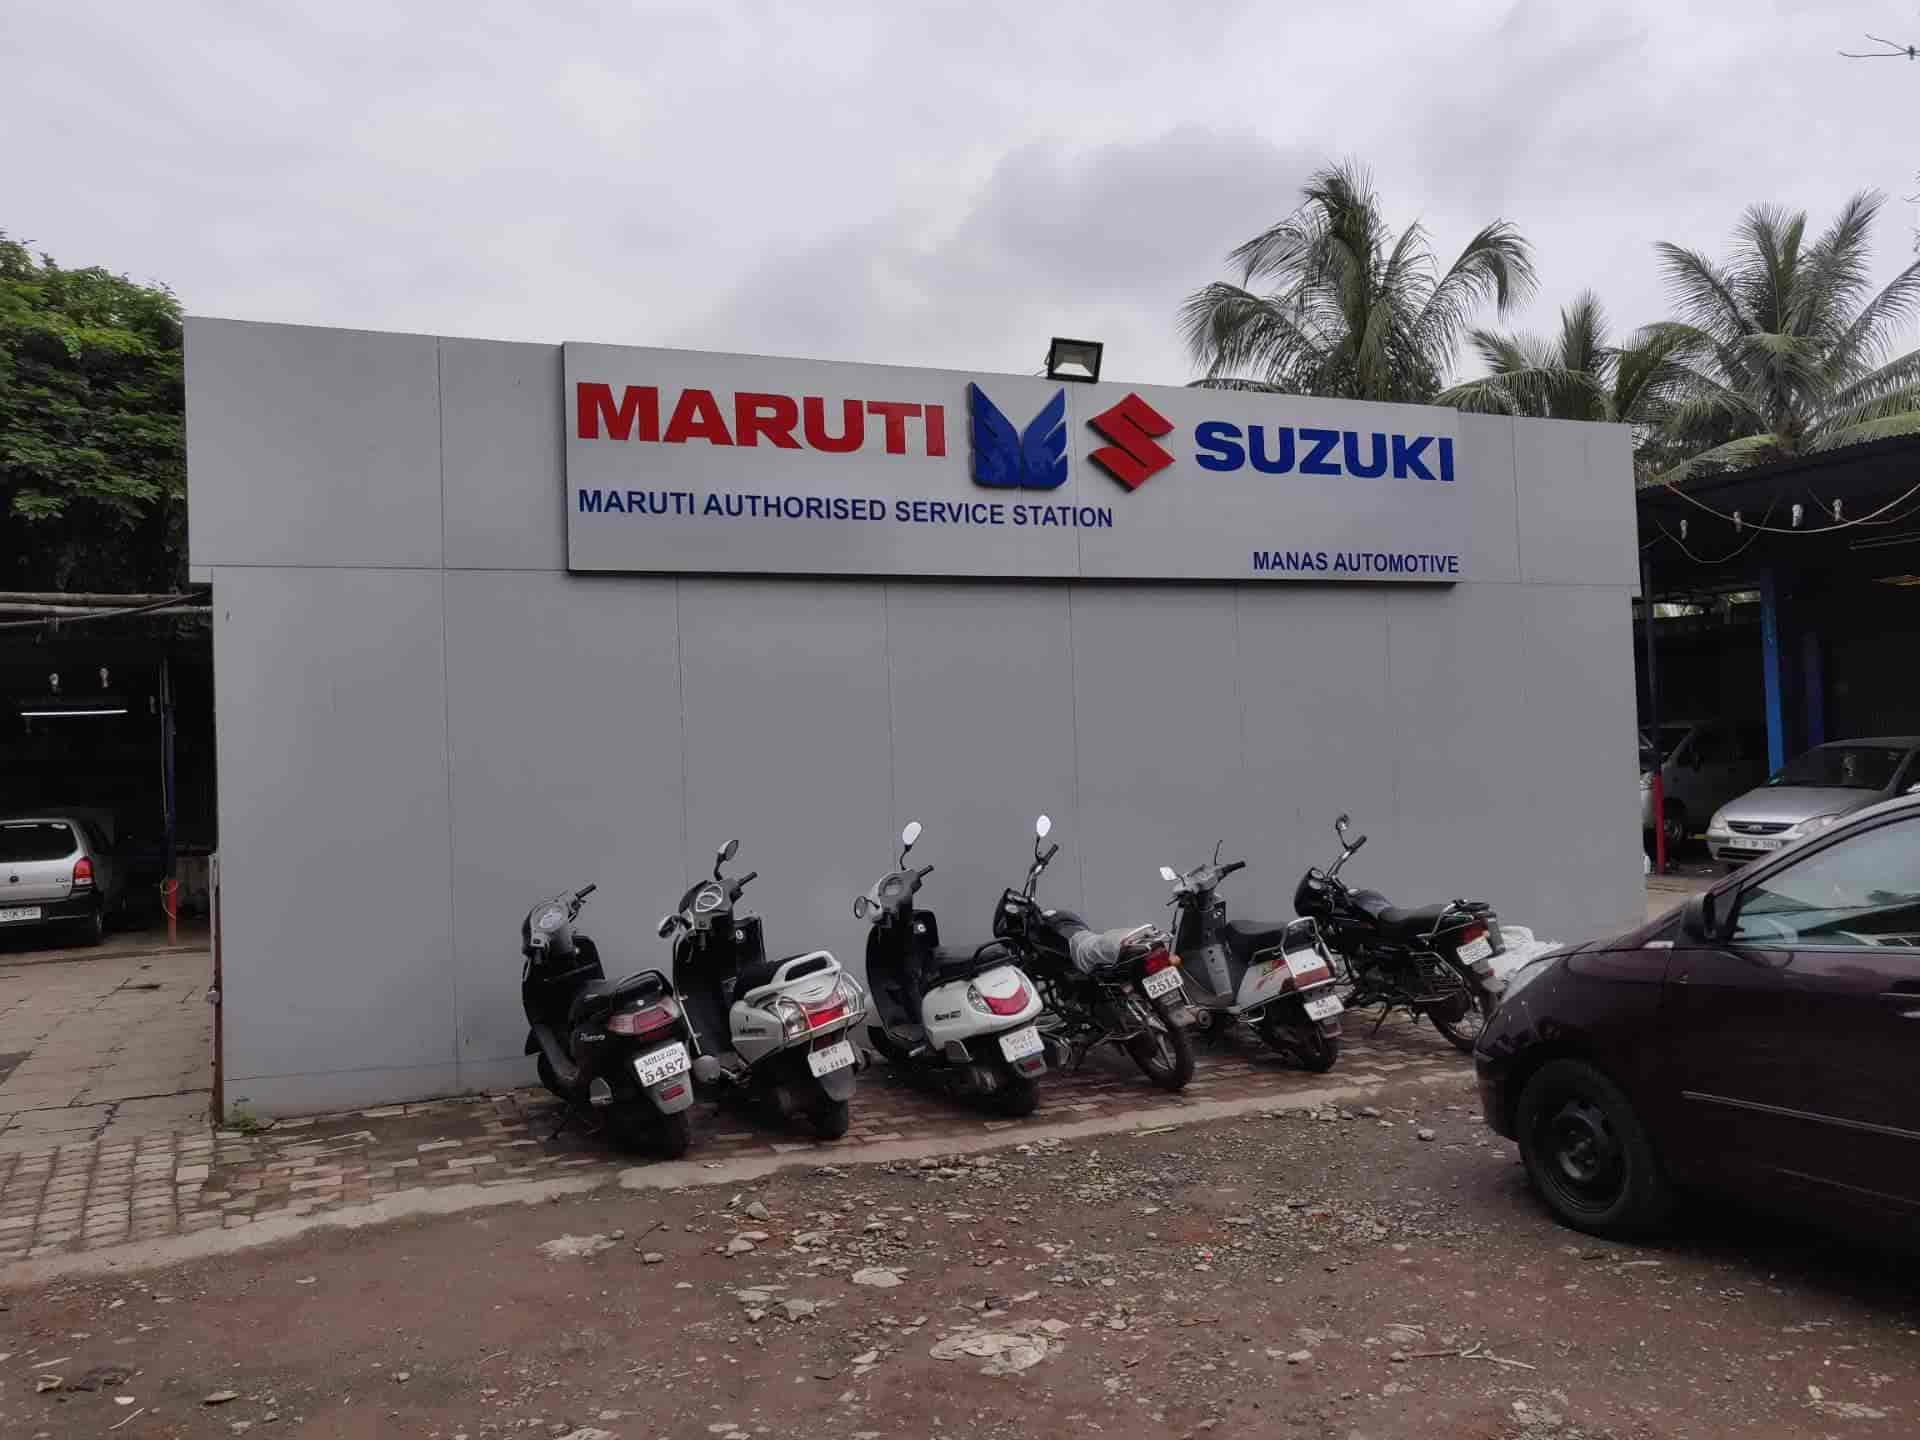 Manas Automotive Karve Nagar Hingne Budrukh Car Repair Services Maruti Suzuki In Pune Justdial